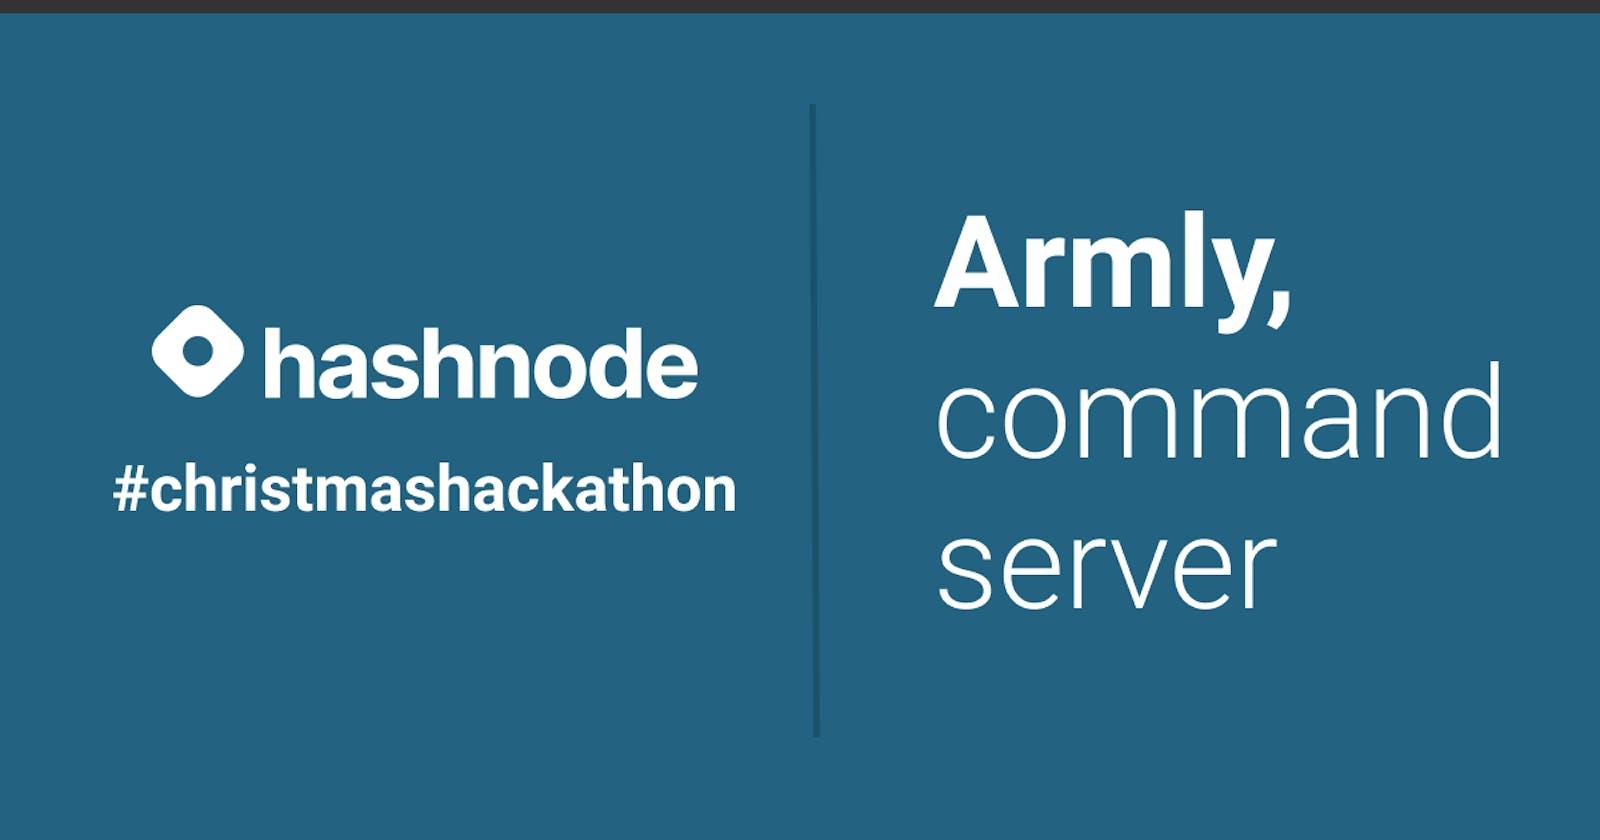 Armly, command server for #christmashackathon.